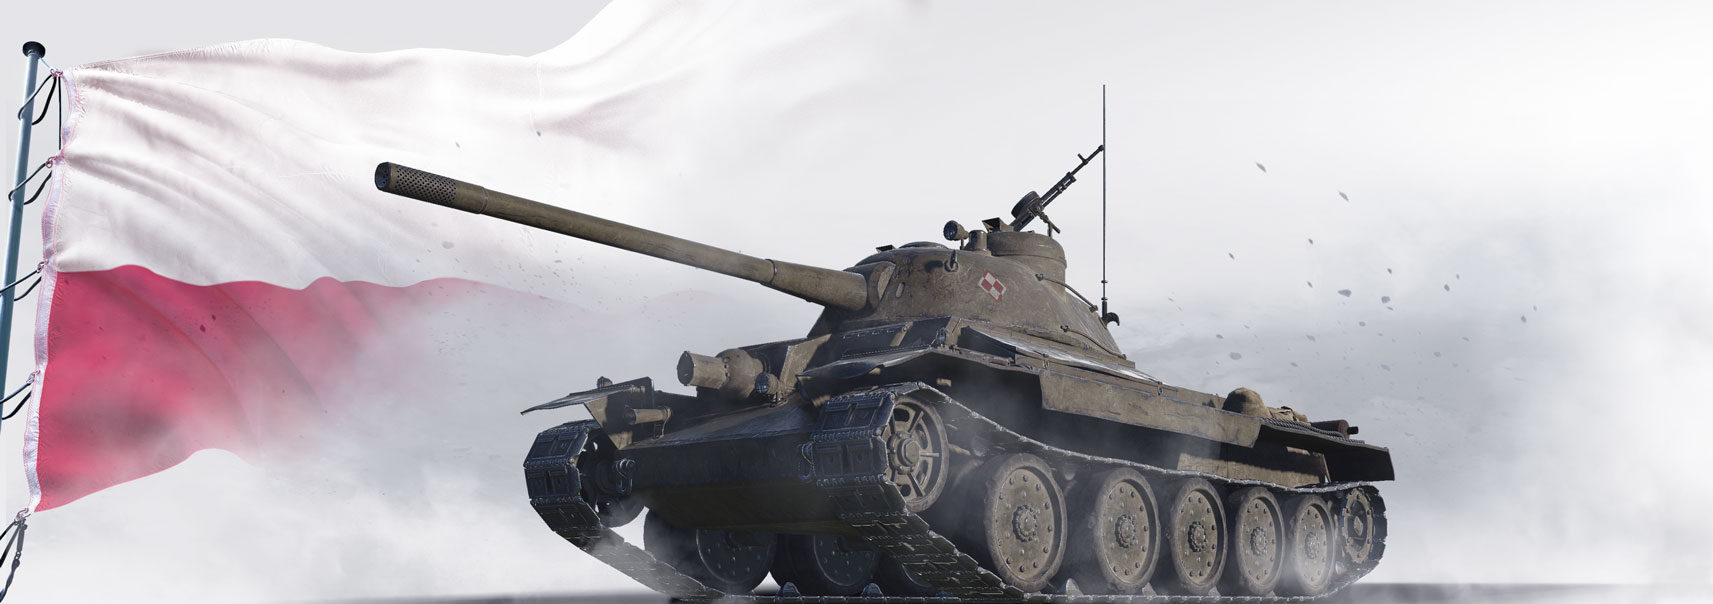 WoT_Template_New_Tank_DS_PZInz_EN-e1593176114670 (1)